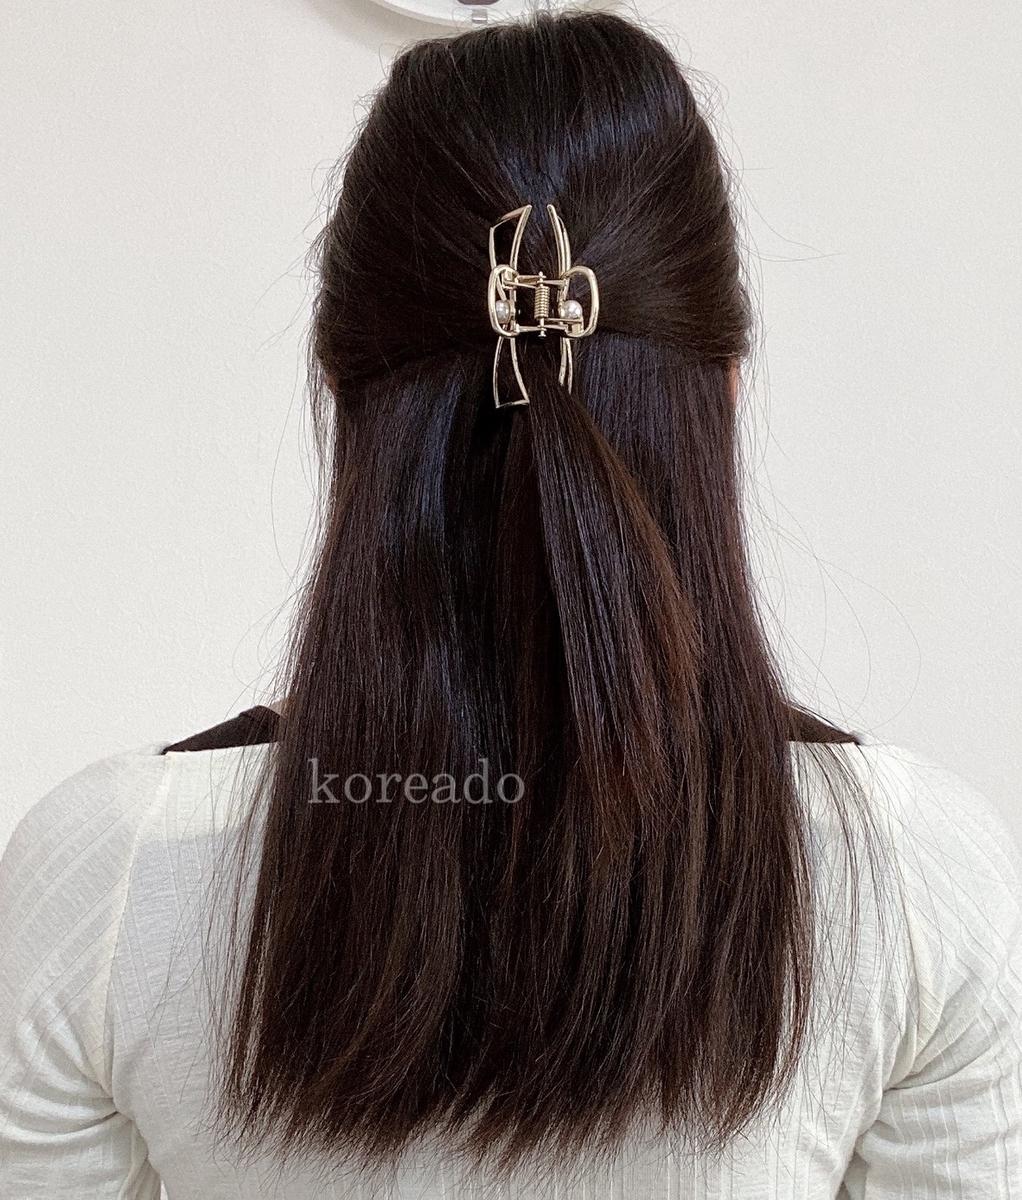 f:id:i-love-korea:20210424173005j:plain